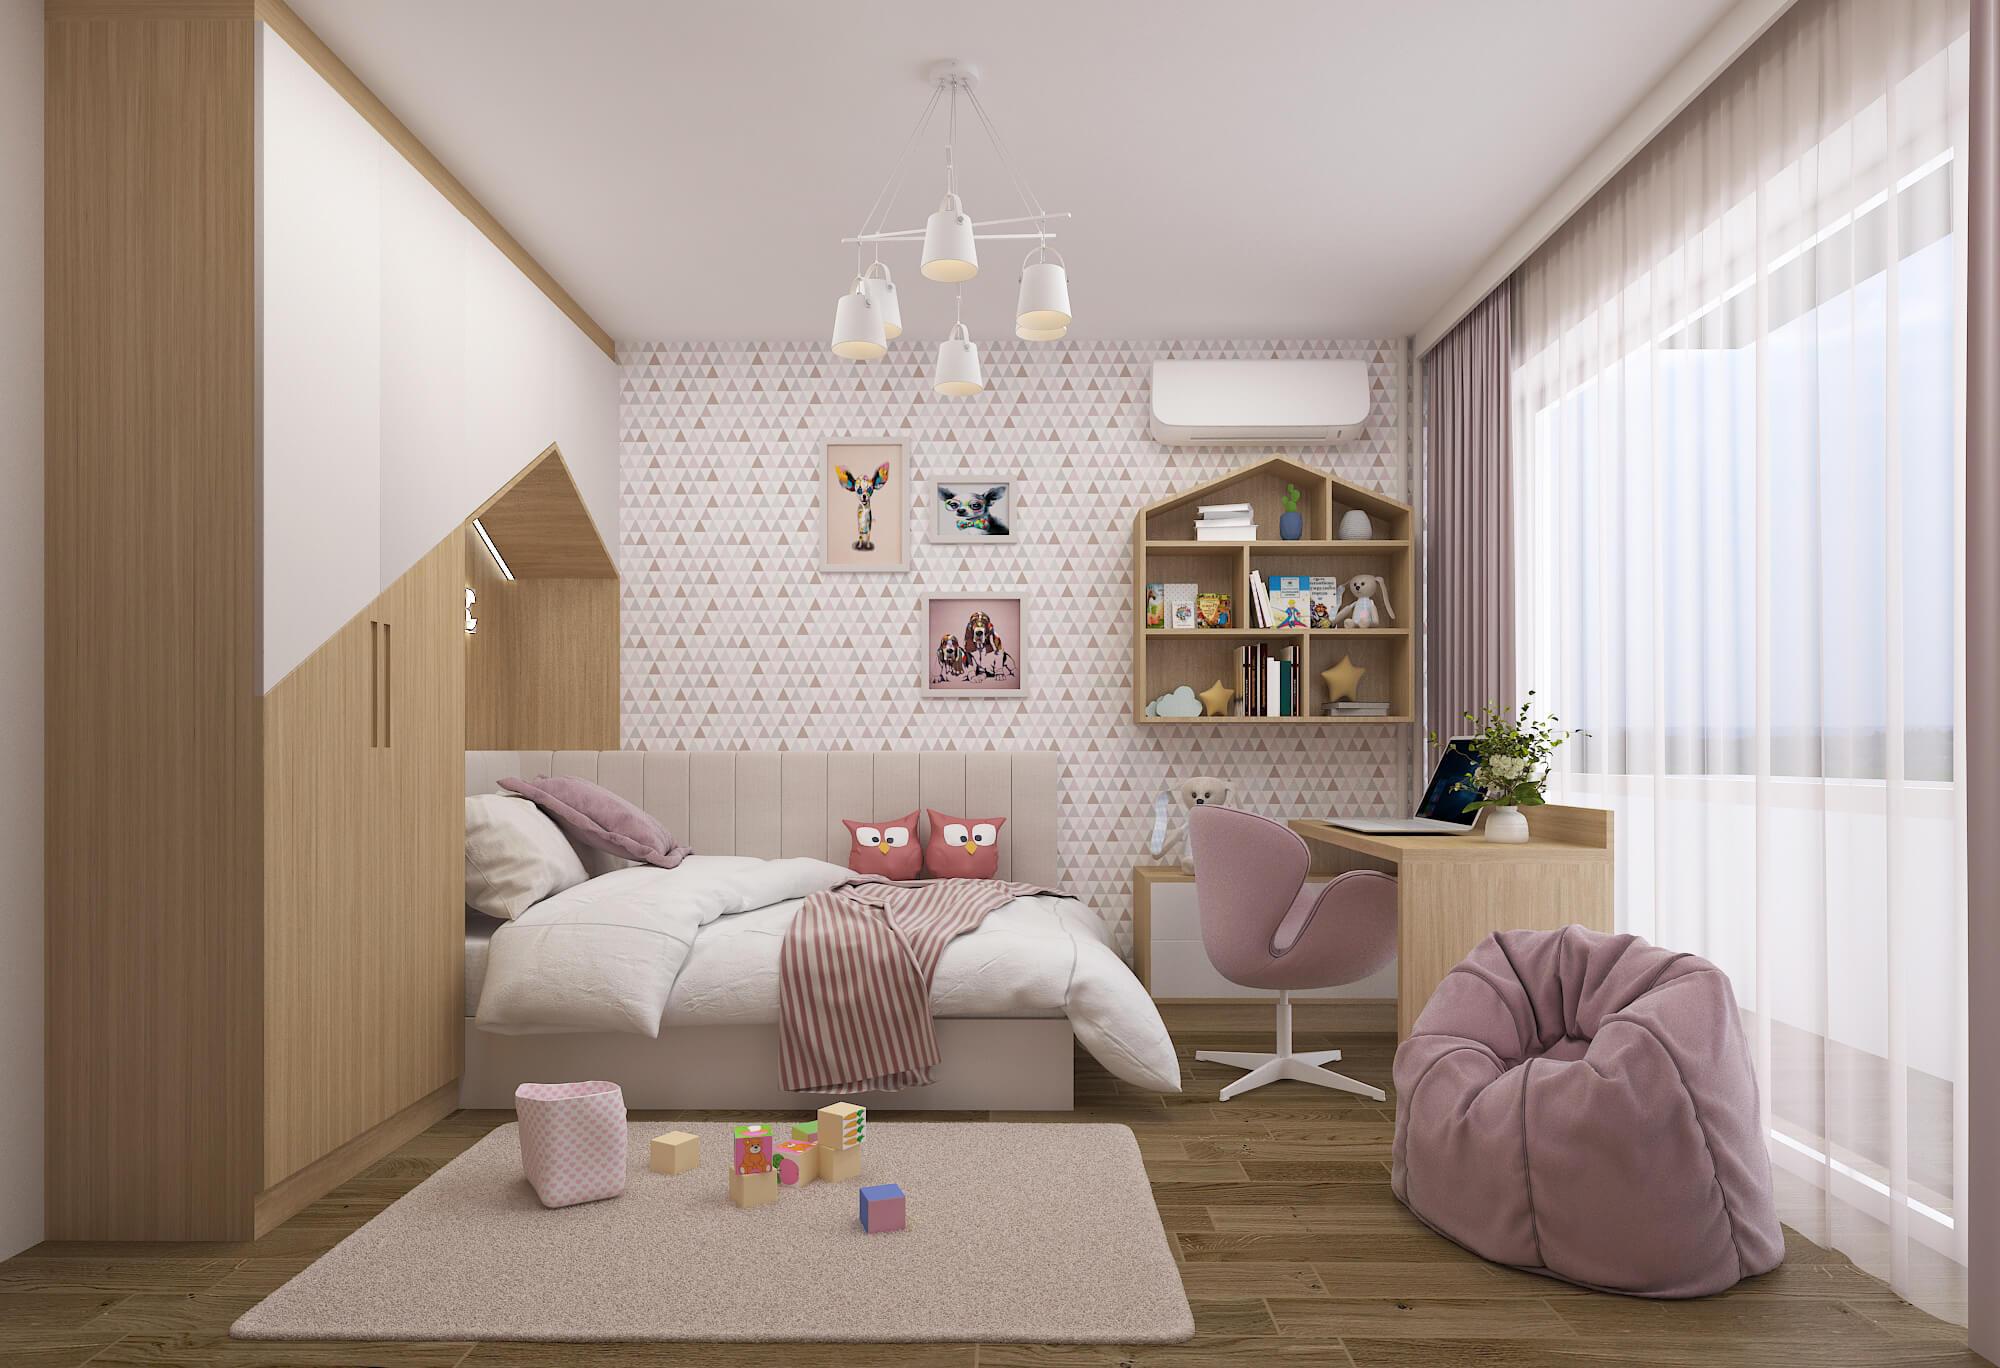 Проект и реализация на <br> момичешка детска стая <br> гр. София